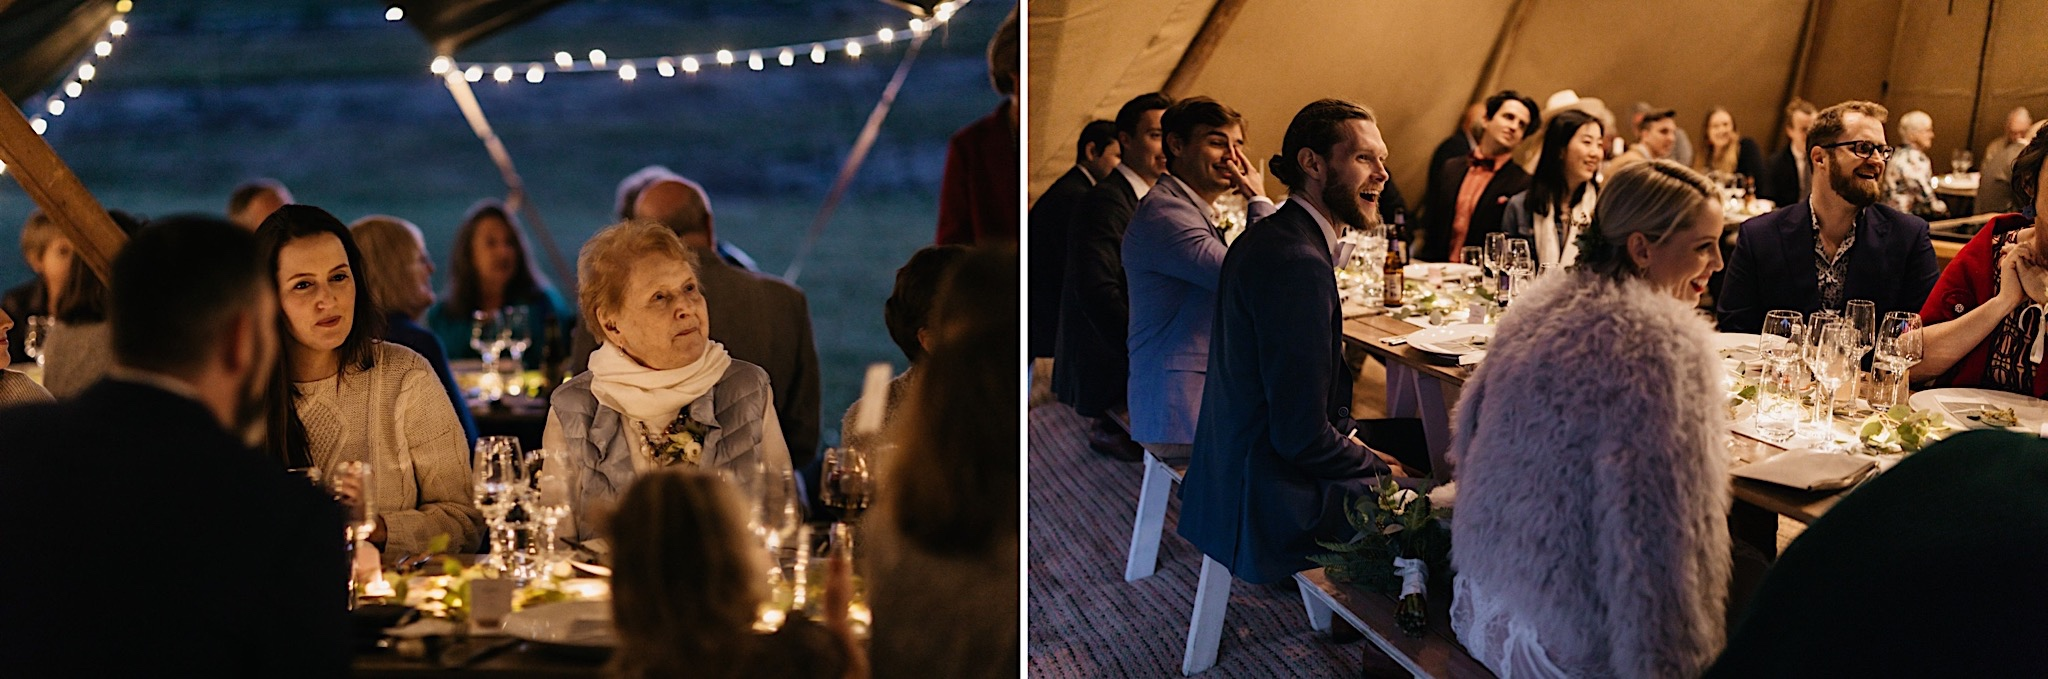 095_SBA-Jen-Tom-Wedding-369_SBA-Jen-Tom-Wedding-366.jpg